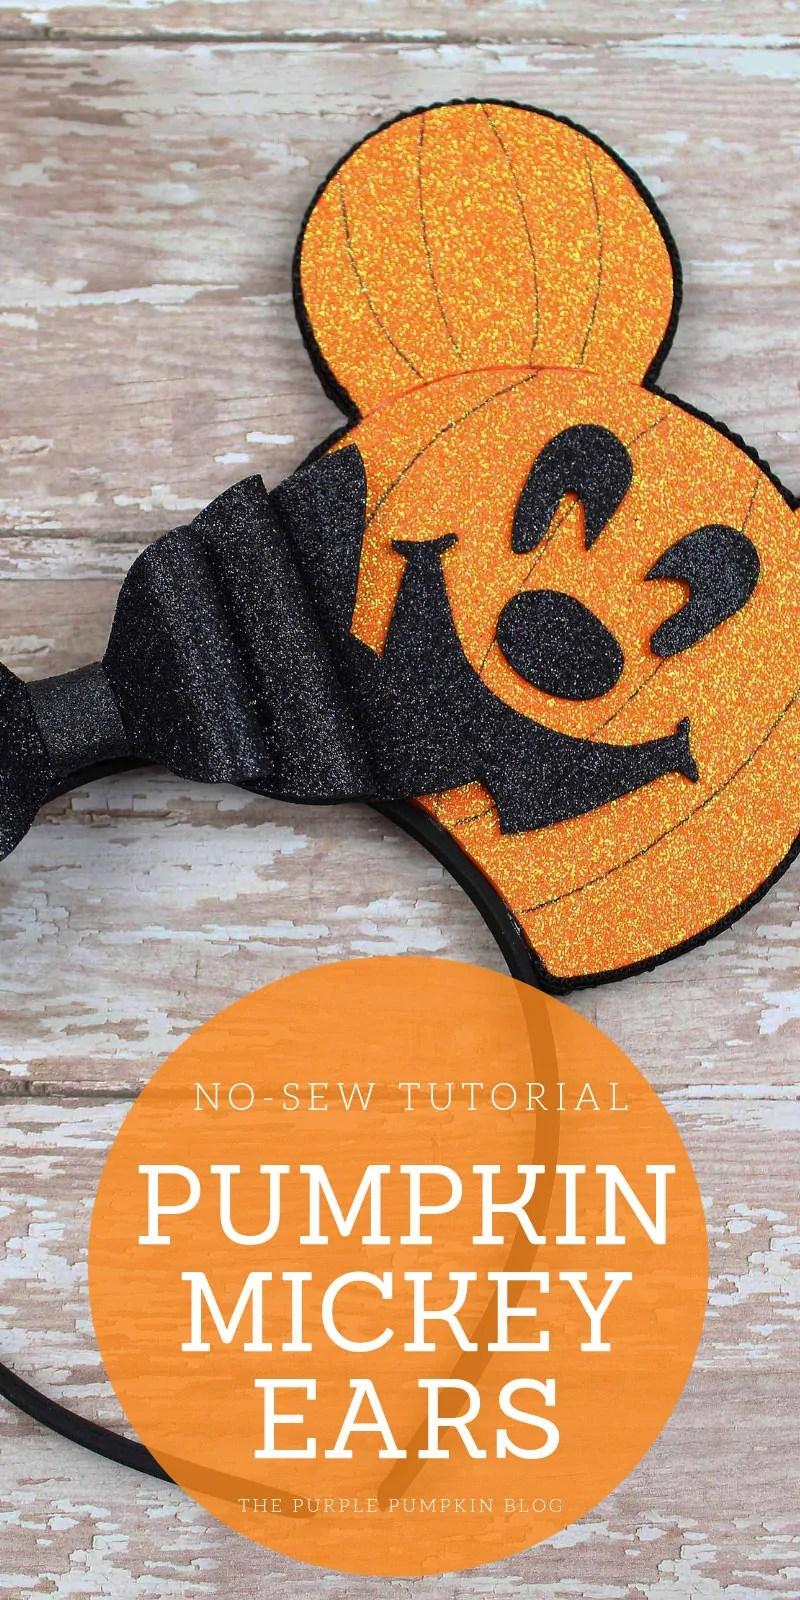 No-Sew Tutorial - Pumpkin Mickey Ears